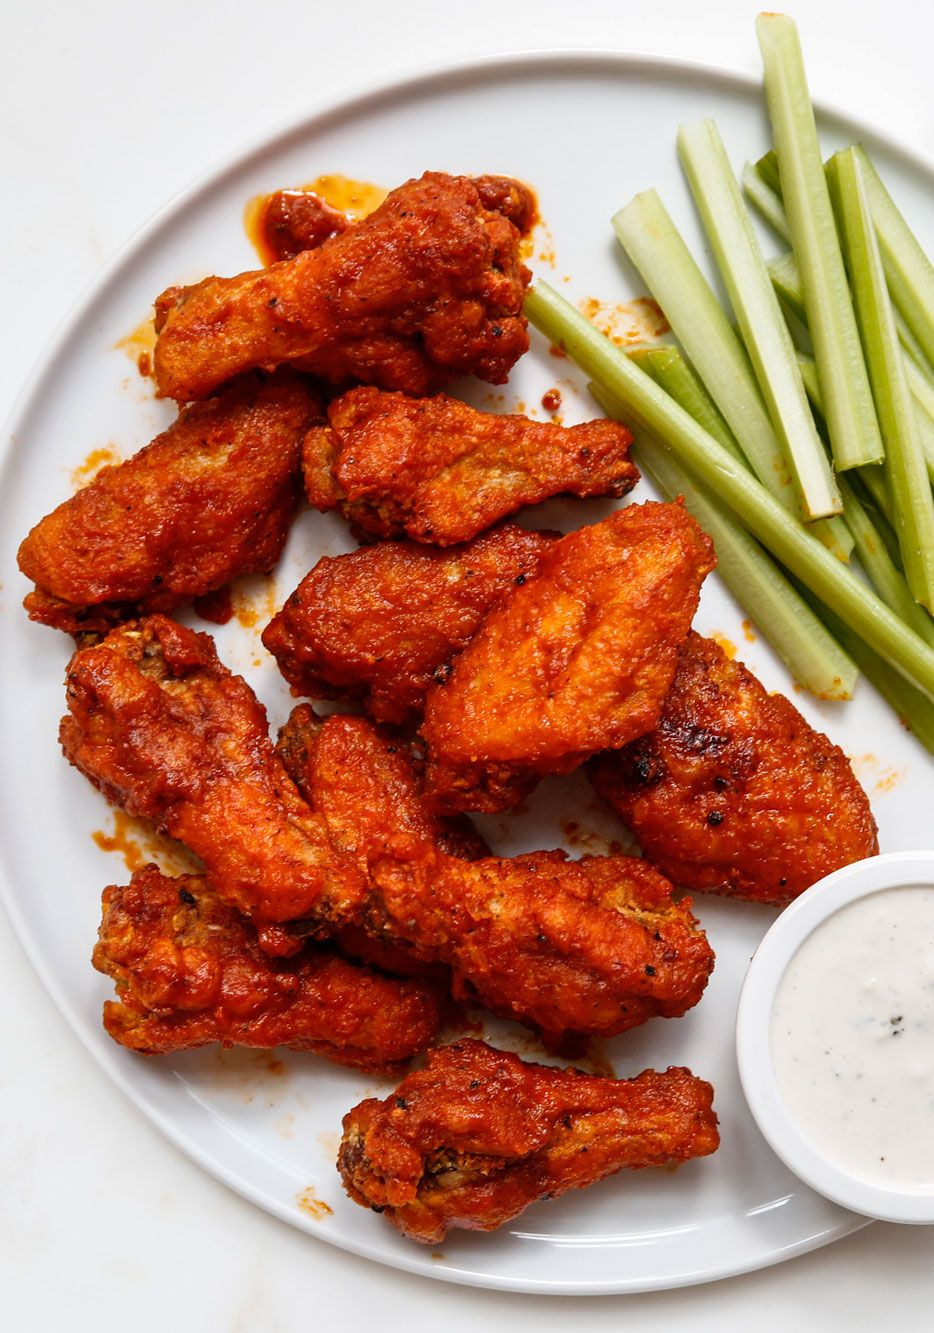 Ba S Best Buffalo Wings Recipe Hot Wing Recipe Chicken Wing Recipes Wing Recipes